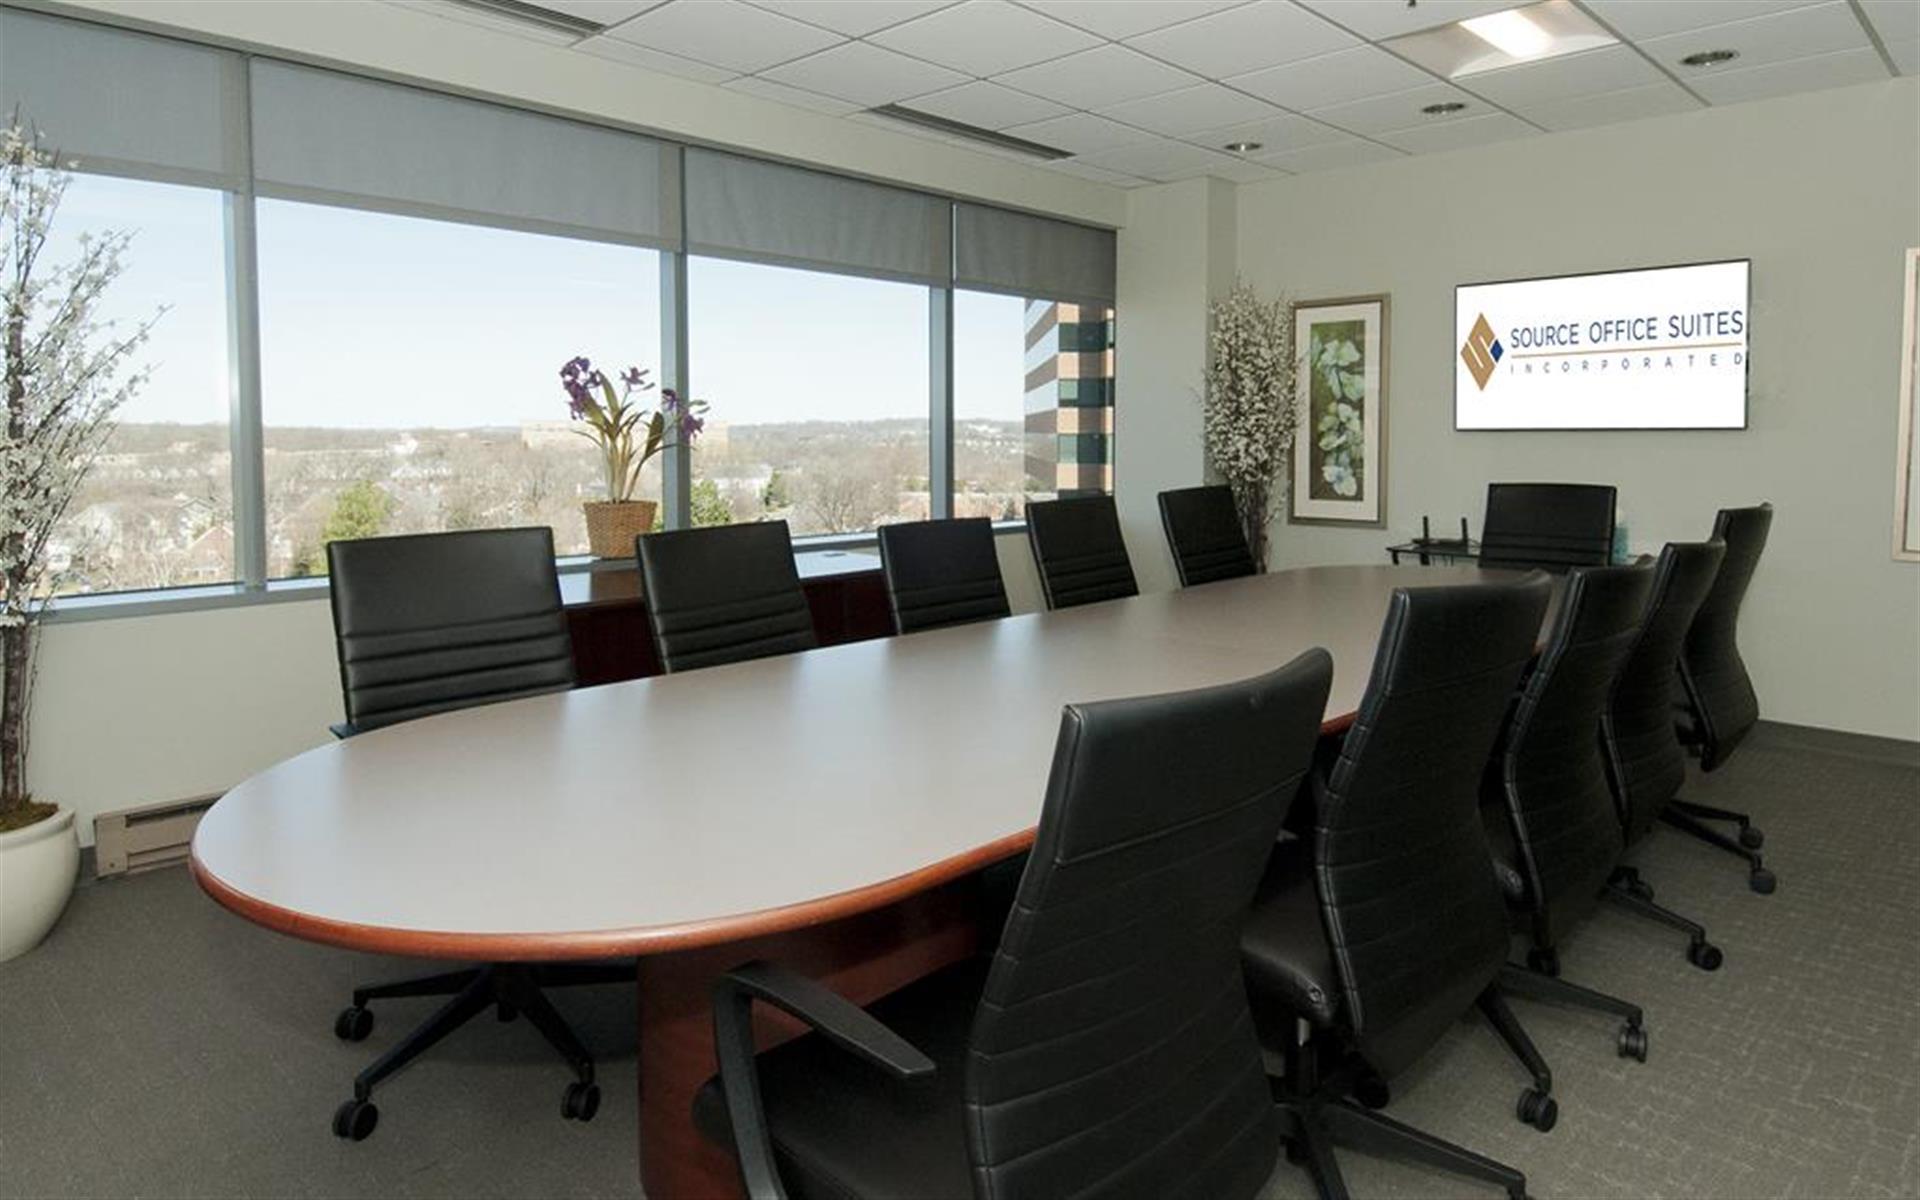 Source Office Suites Arlington - Executive Board Room